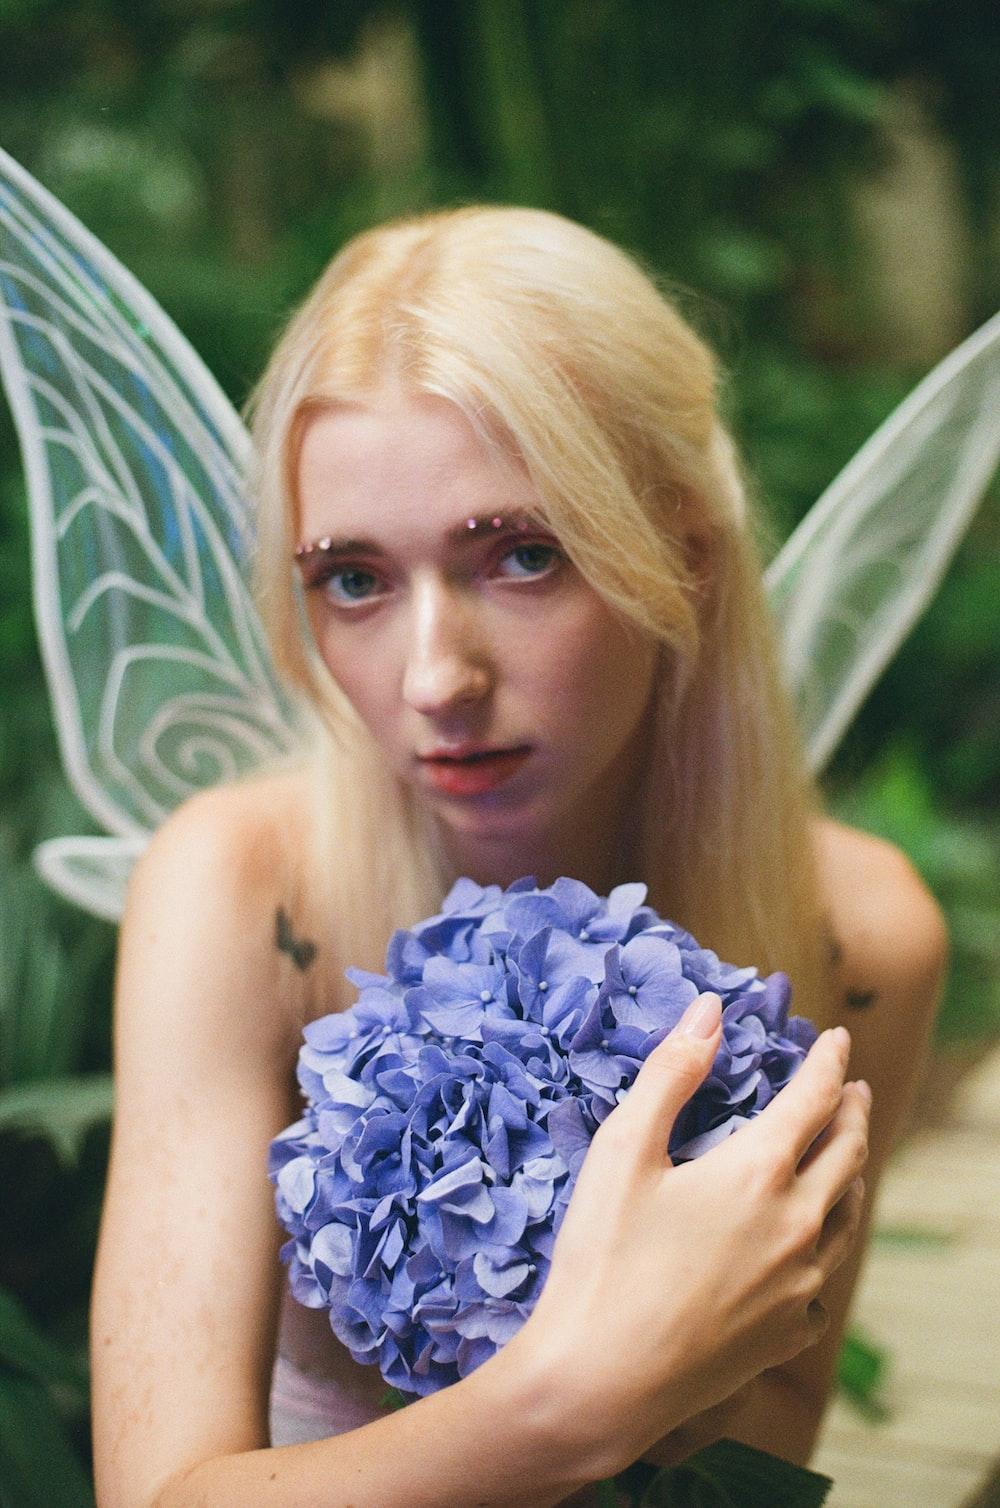 woman holding blue flower bouquet